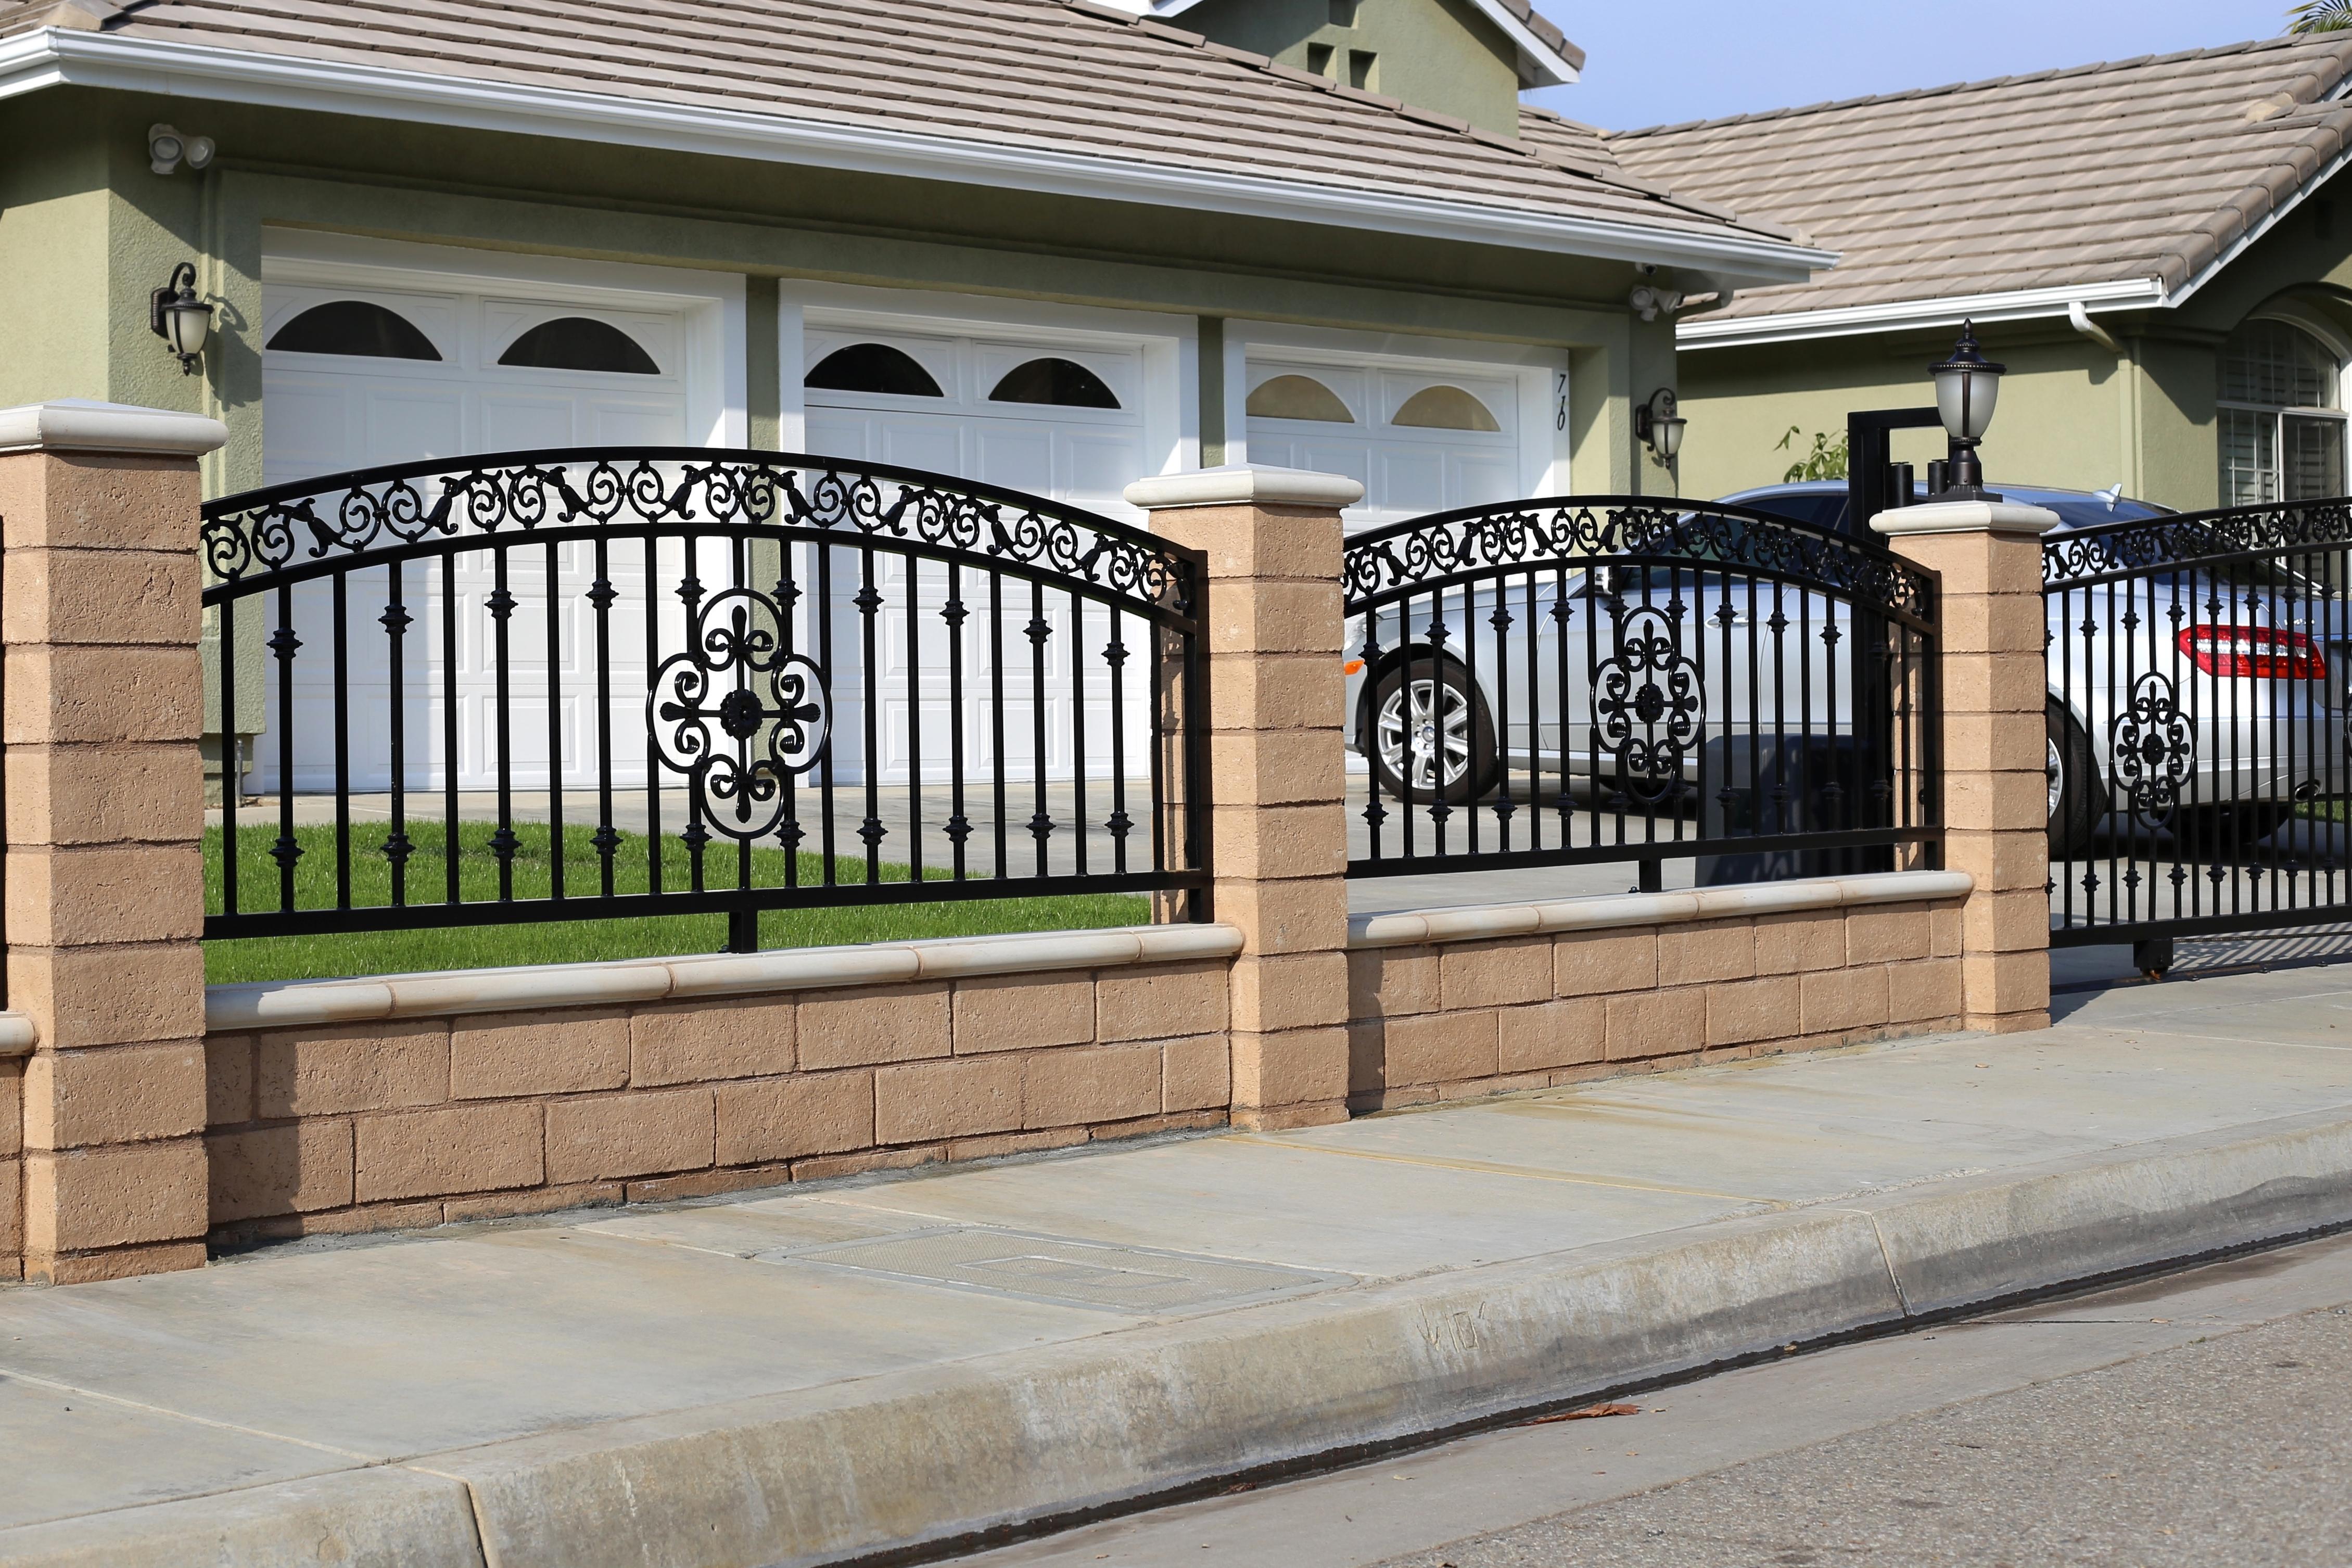 Wrought Iron Fences With Brick Columns